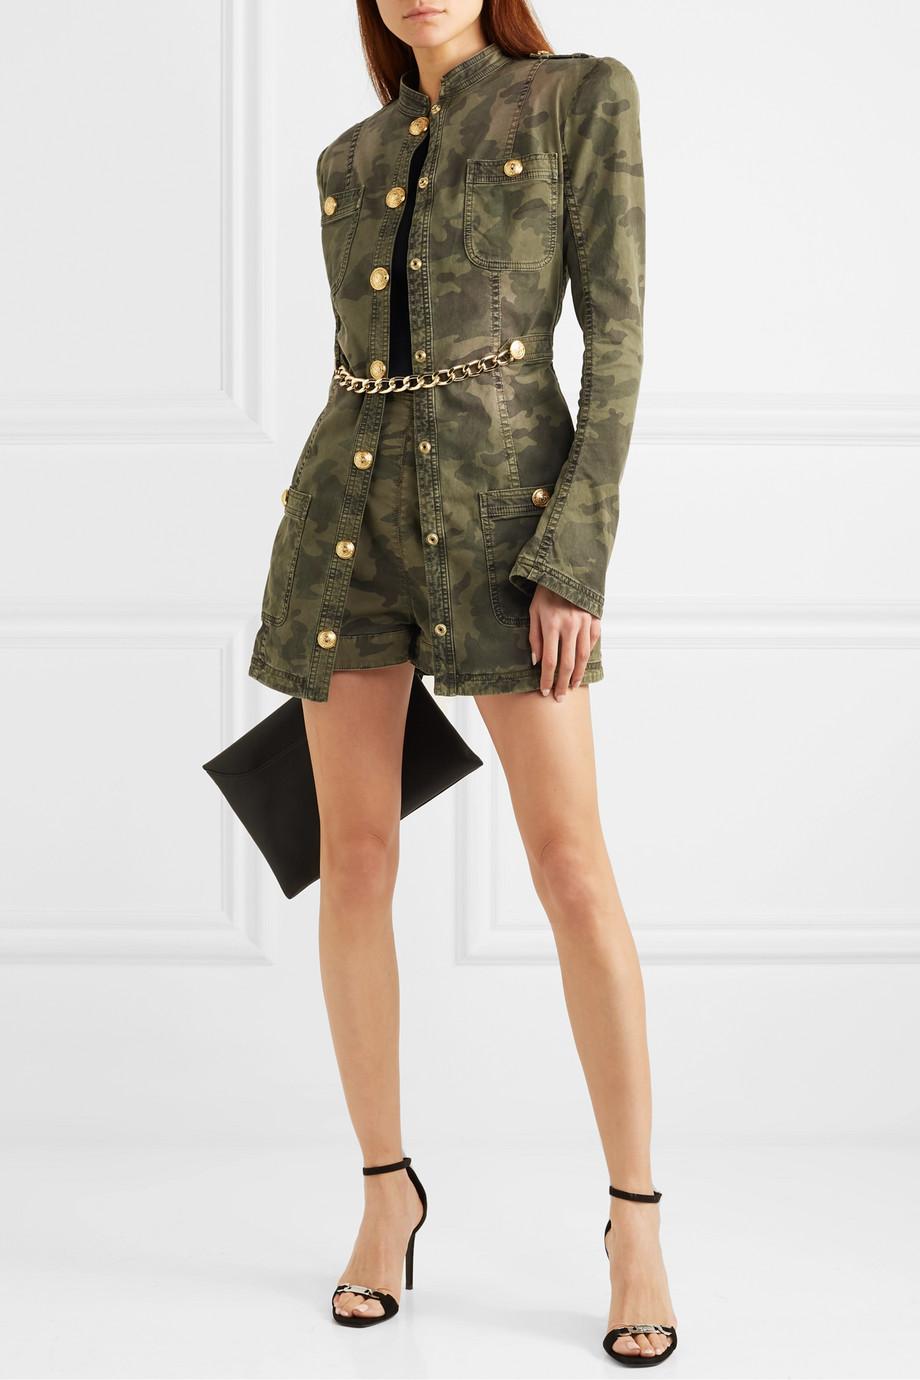 Balmain Chain-embellished camouflage-print cotton-blend jacket